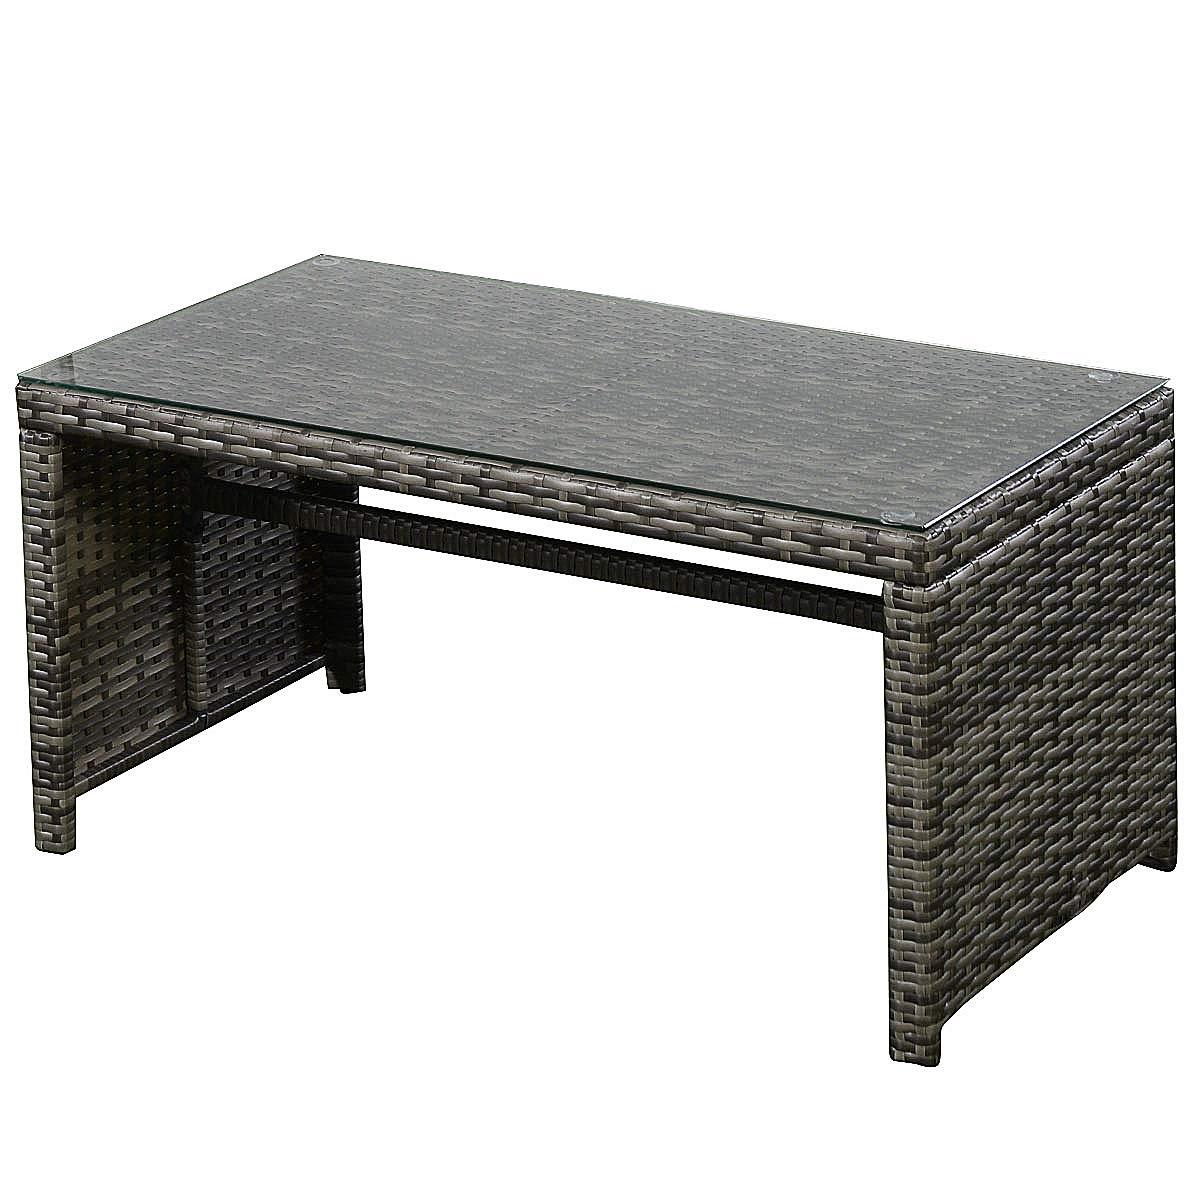 4 pcs Goplus Outdoor Garden Sofa Furniture Set